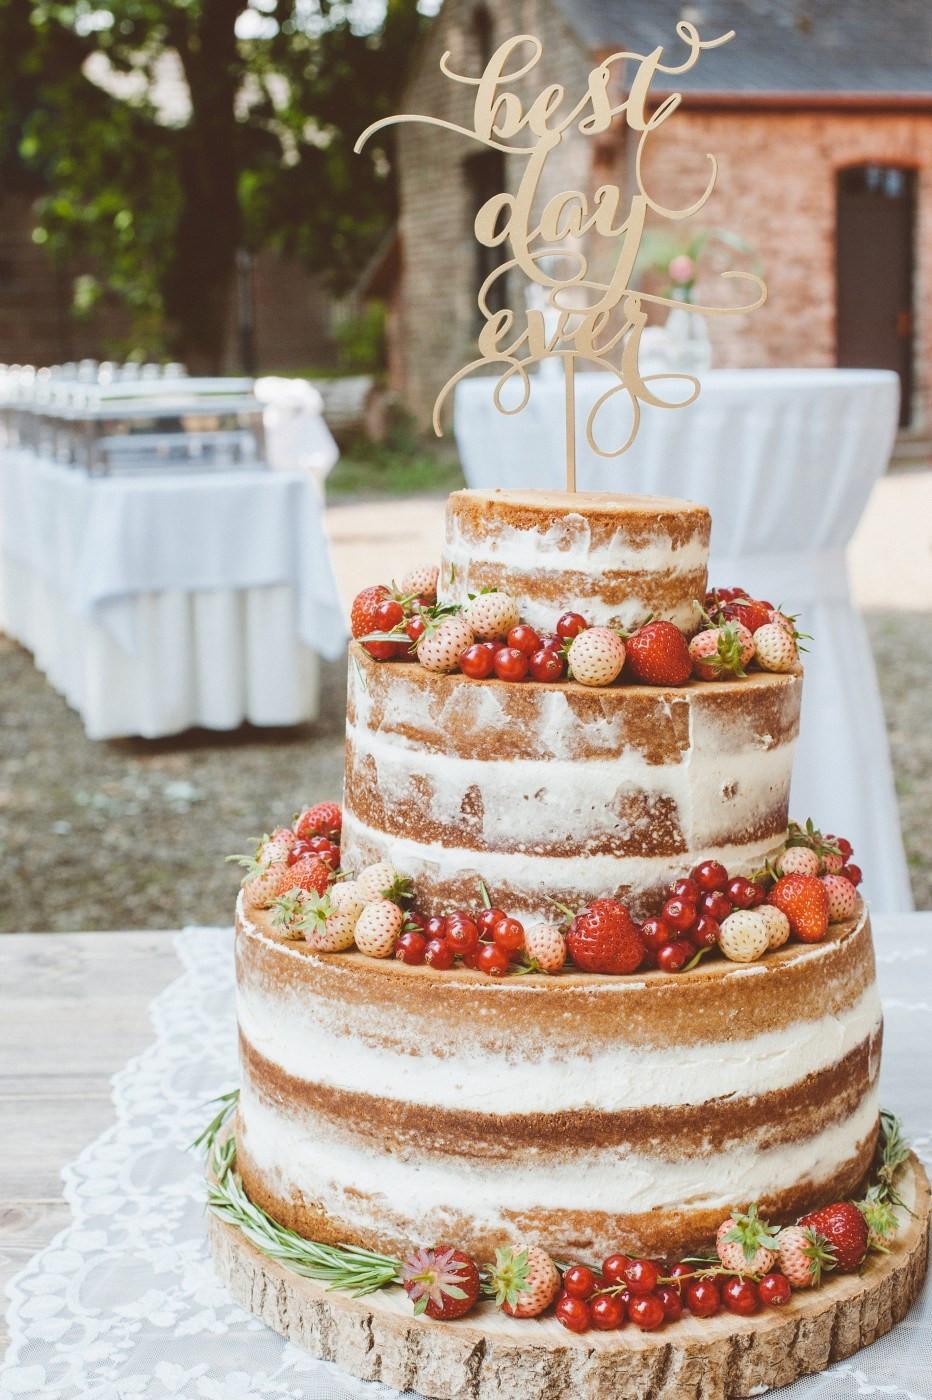 Hochzeitstorte Rezept  Very Berry Wedding Cake Rezept Hochzeitstorte Rezept